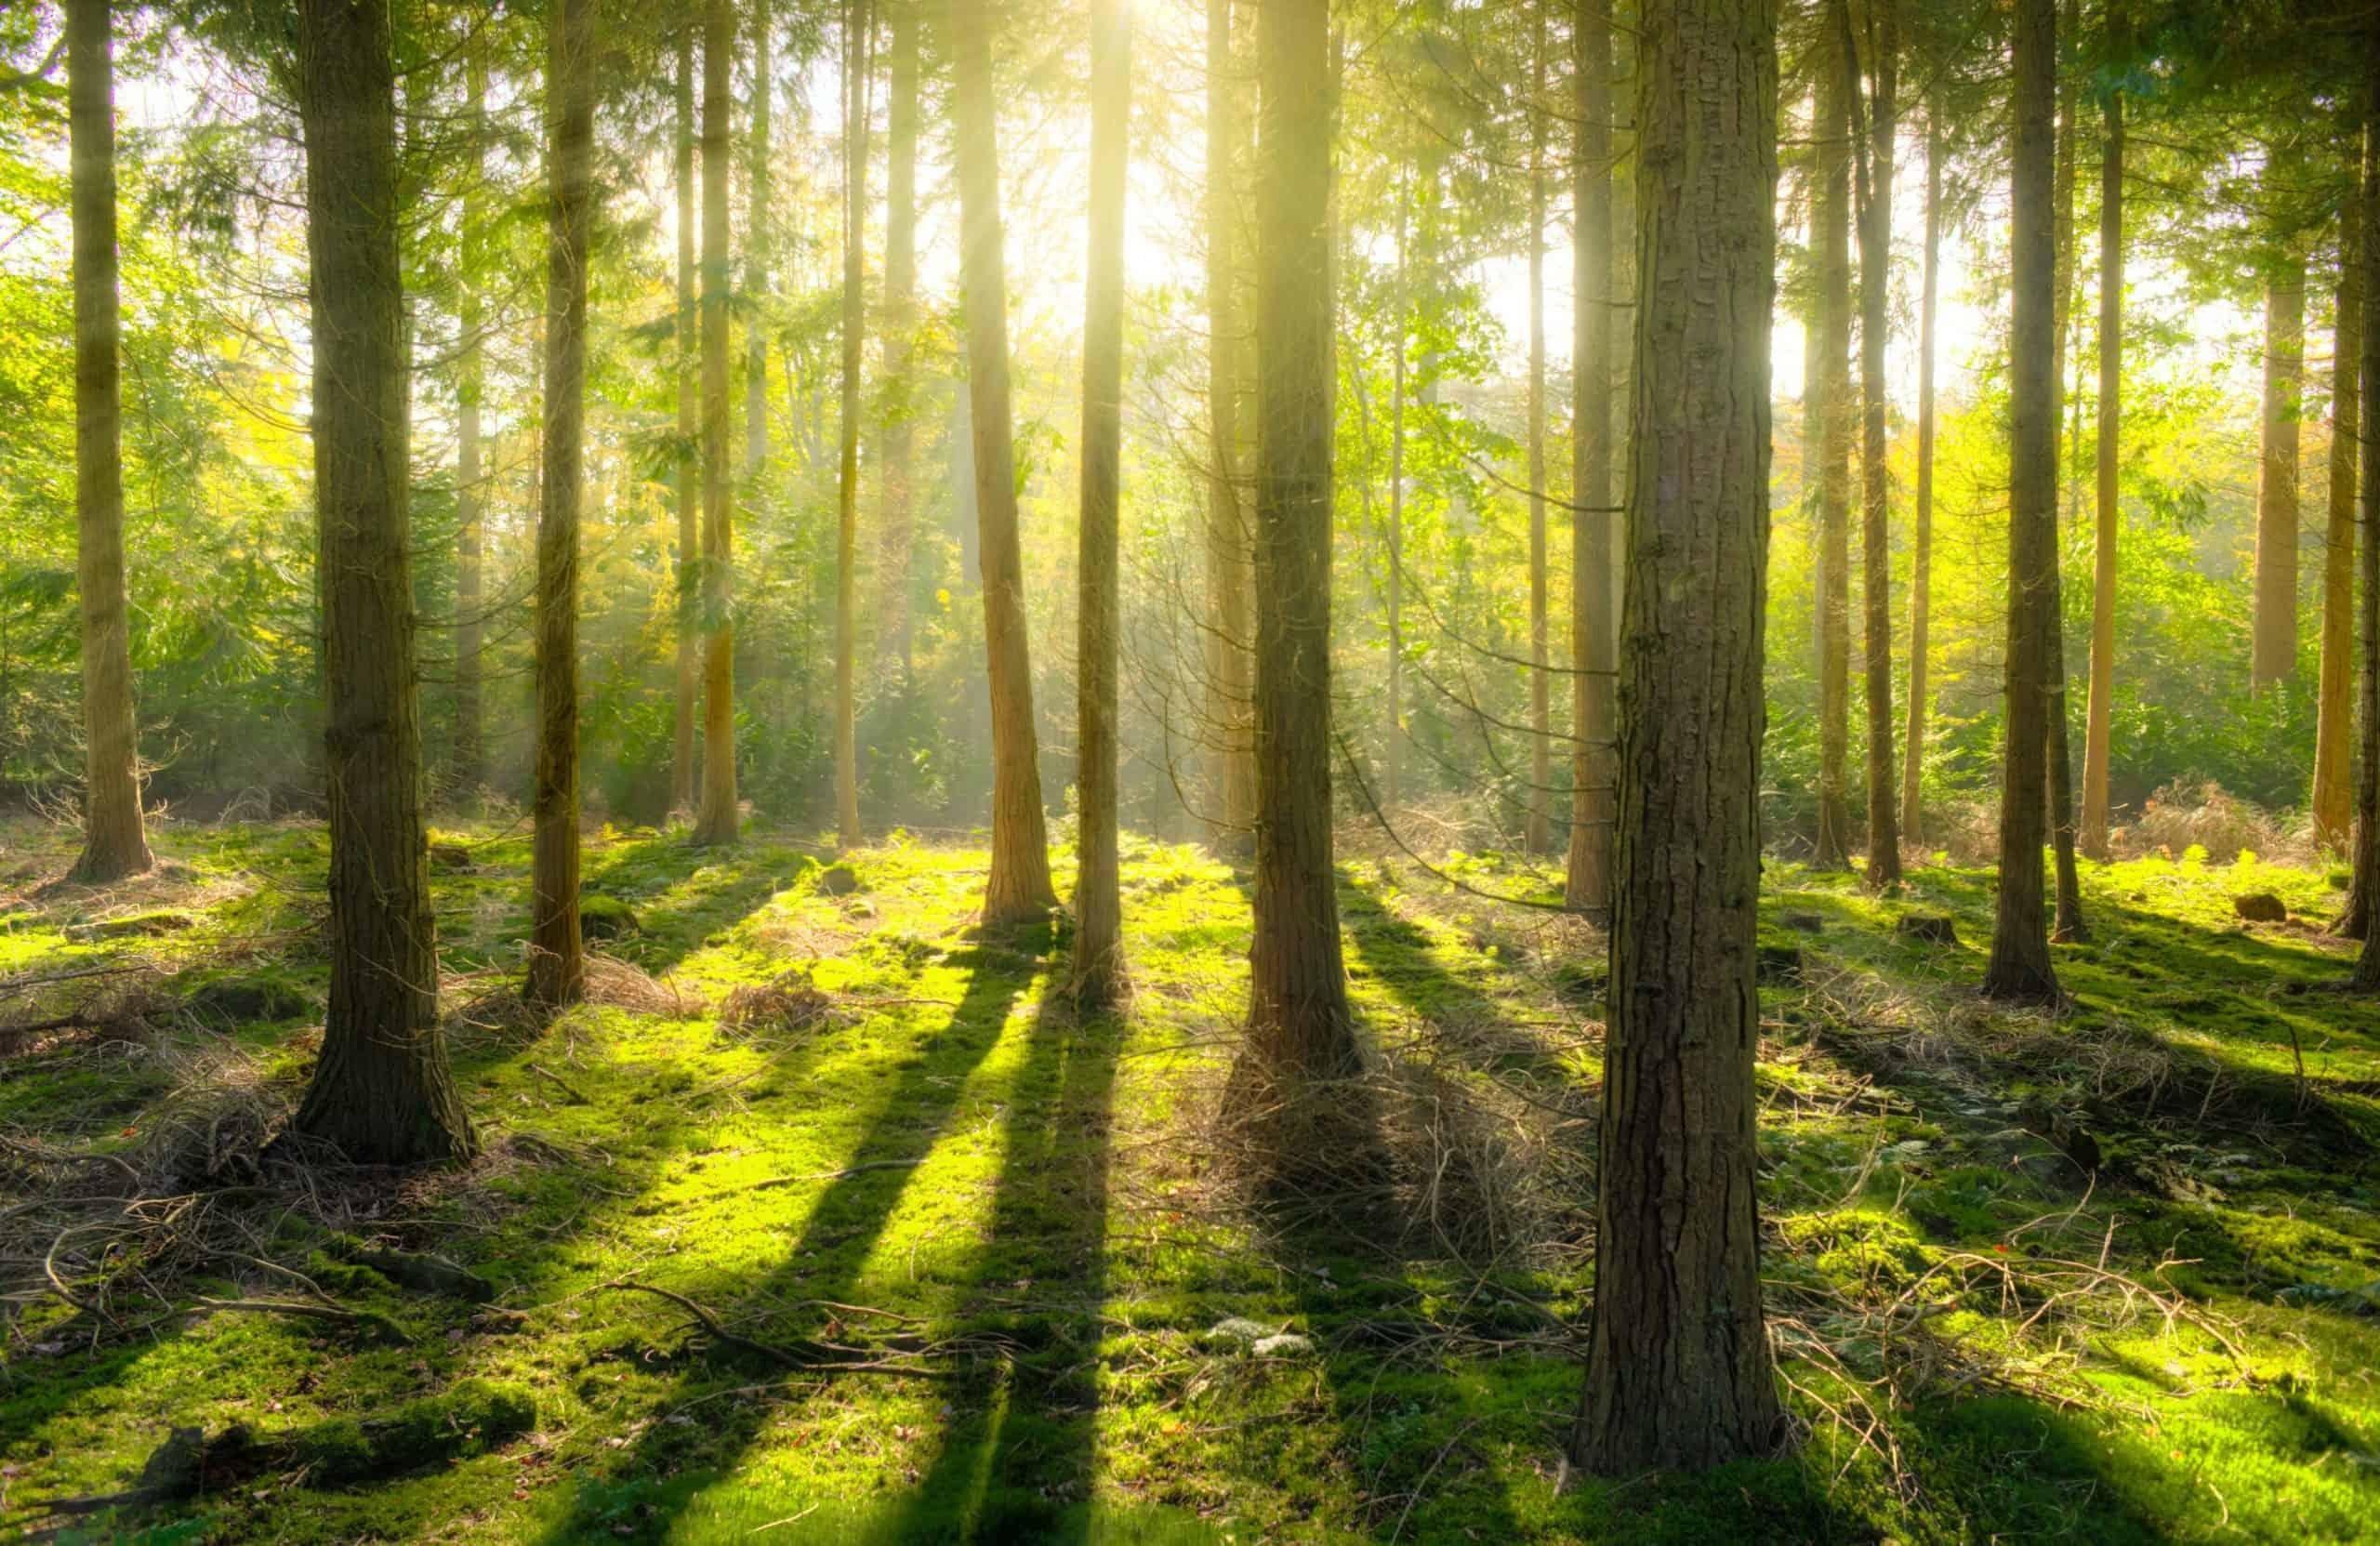 Natural vitamin D comes from lichen